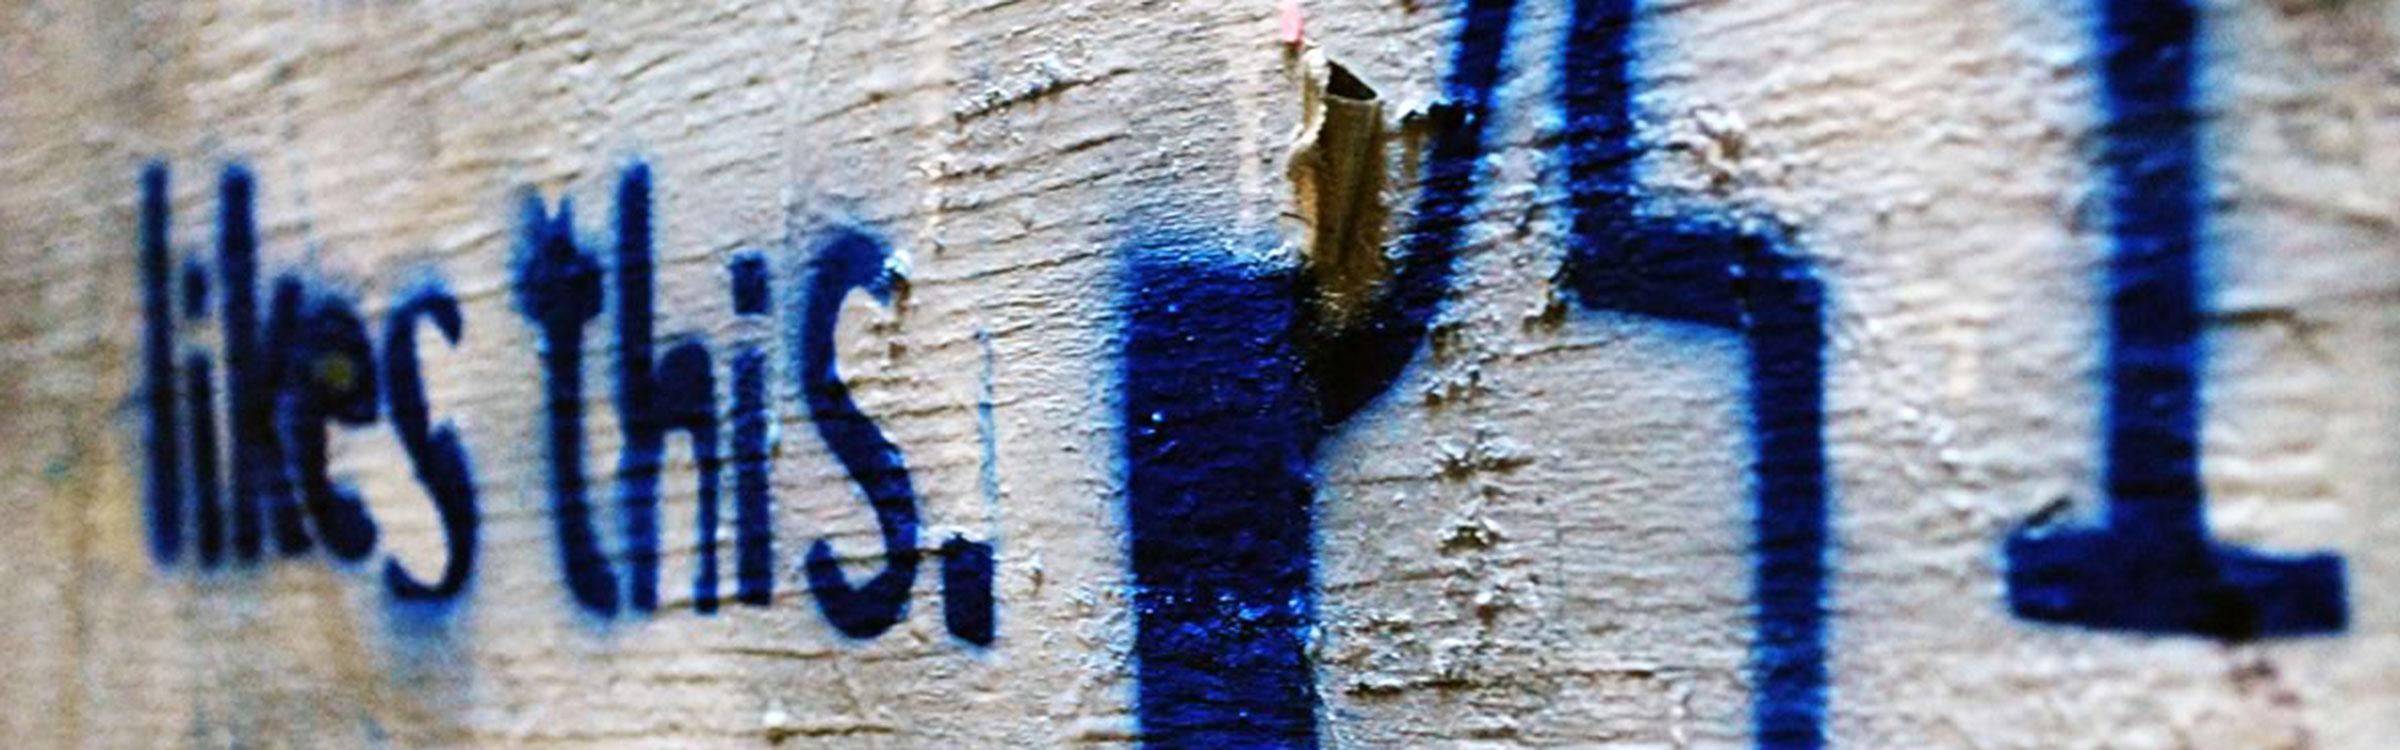 Facebook graffiti